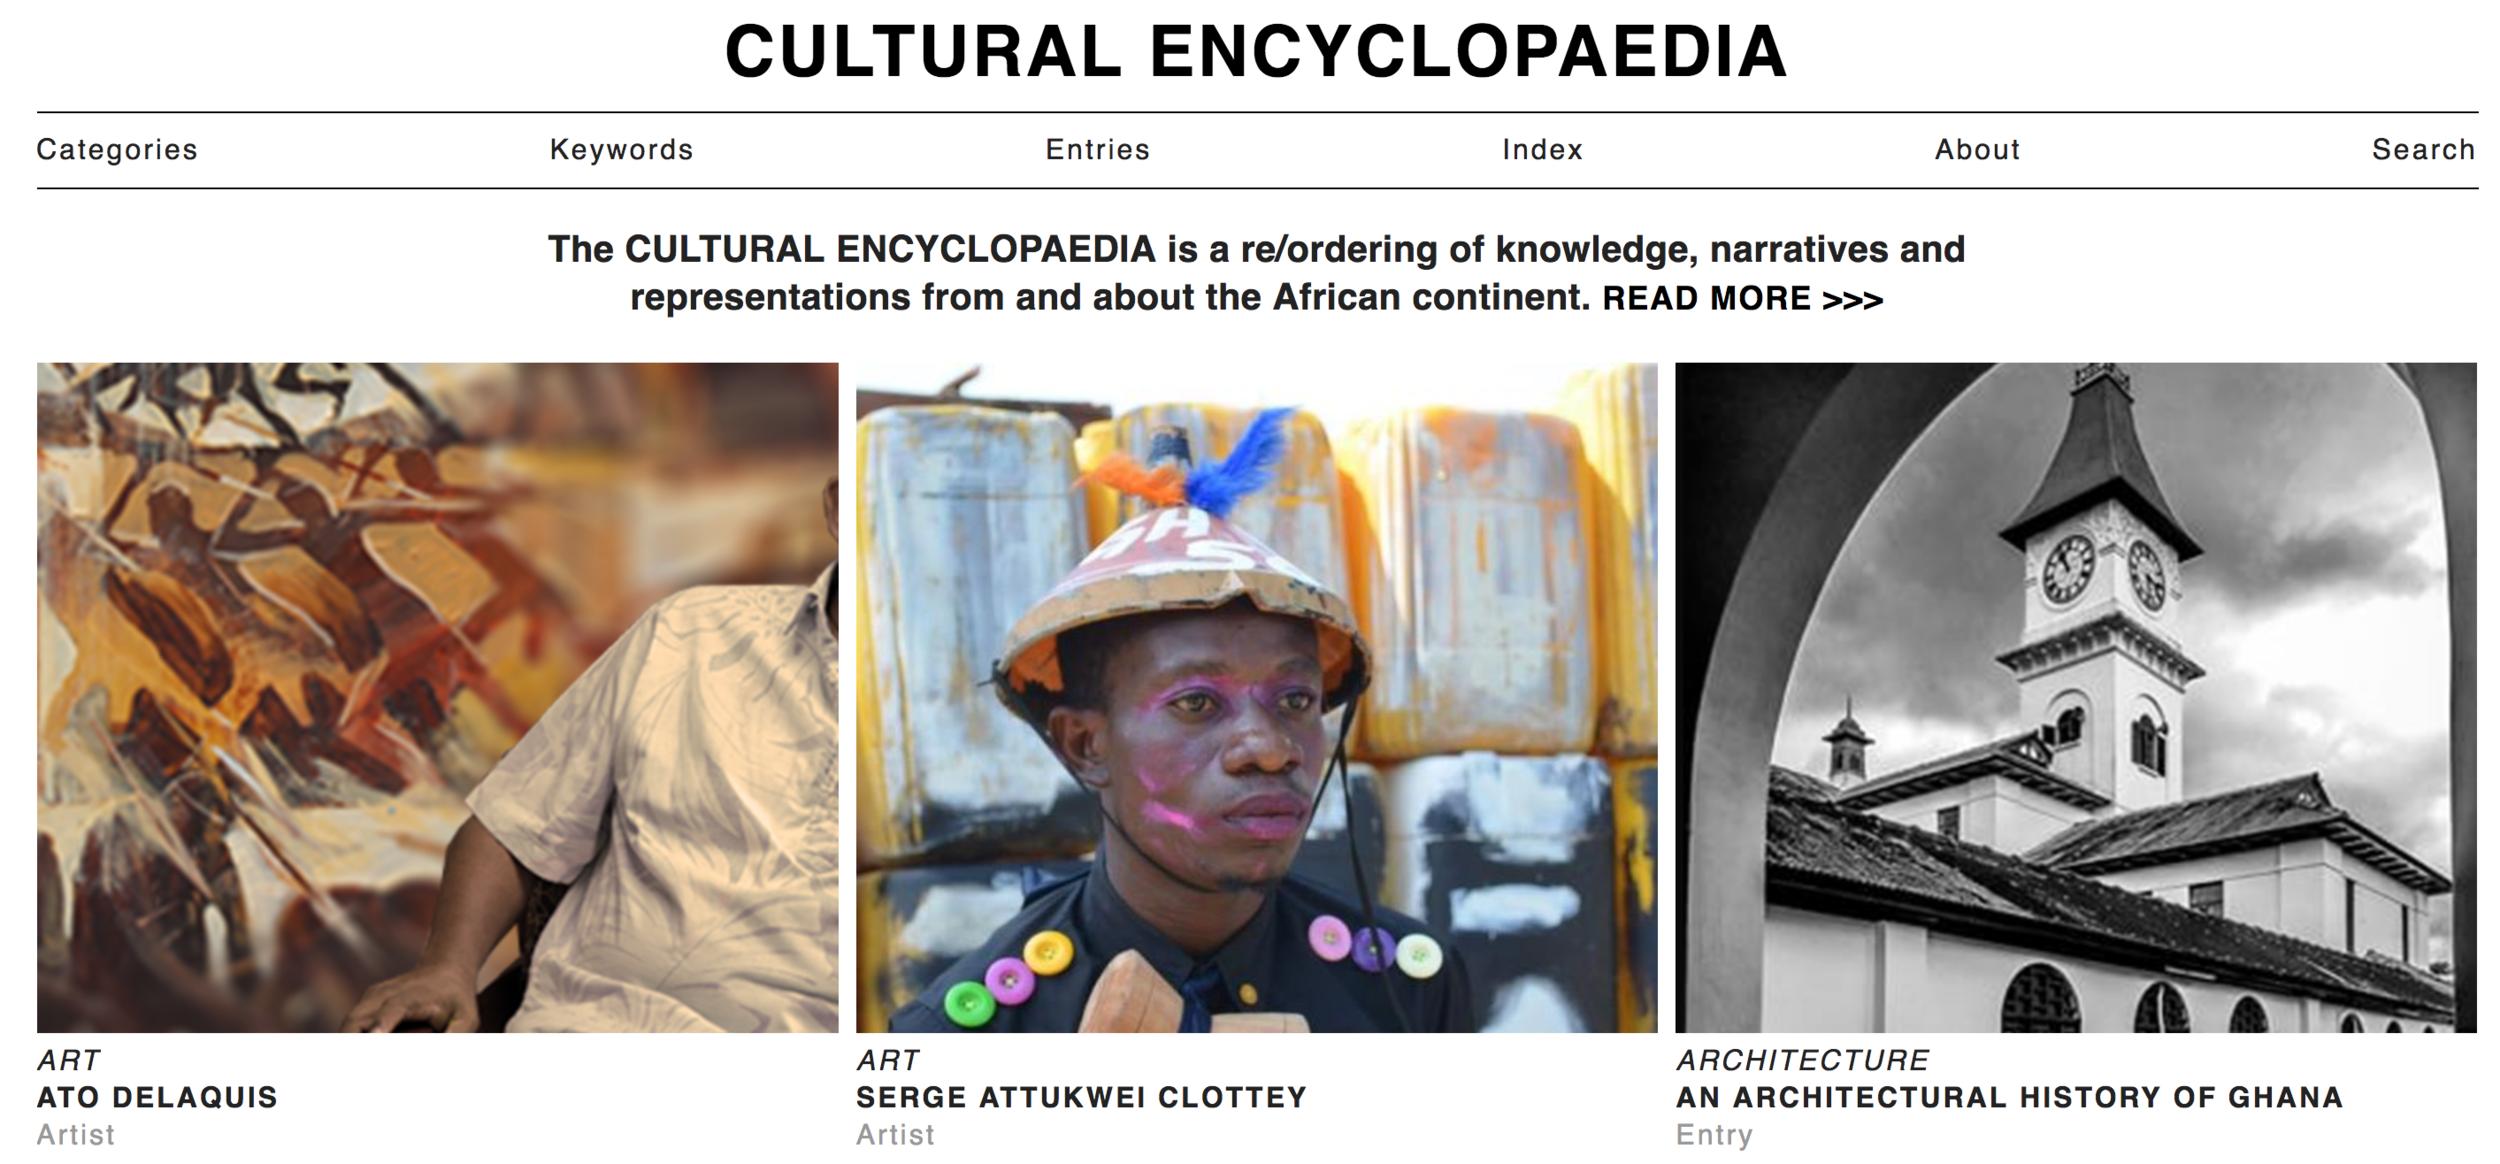 Photo Courtesy of Cultural Encyclopedia